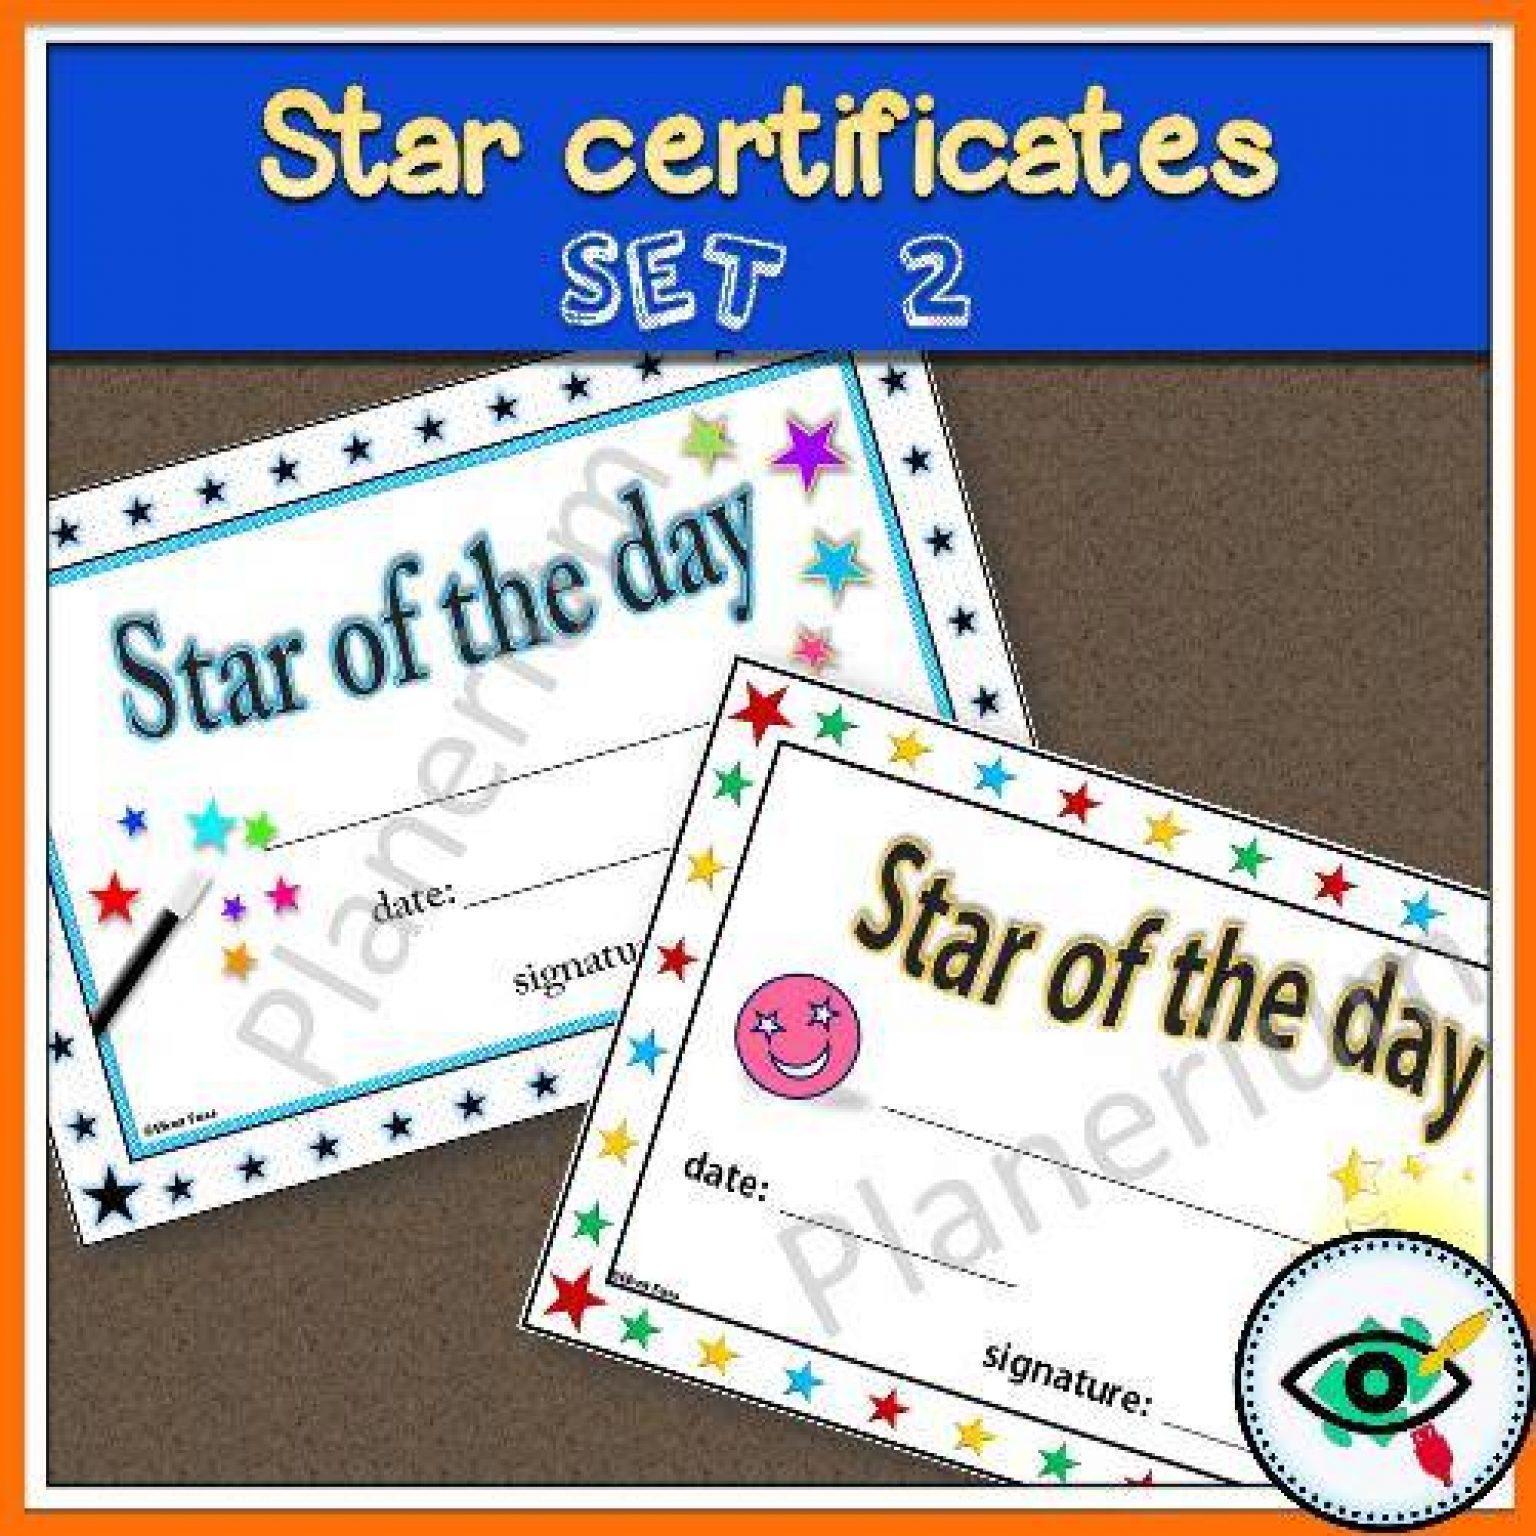 awards_rewards-star-certificates-g2-6-title3_resized